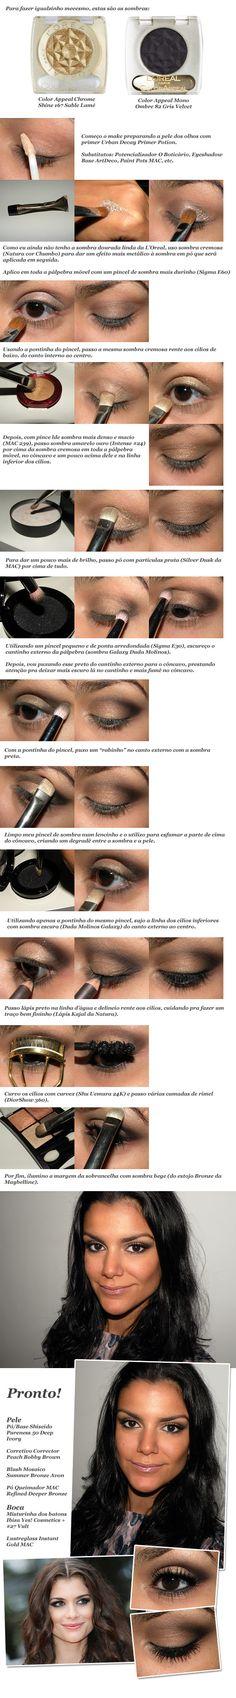 Aline Moraes' makeup in Cannes